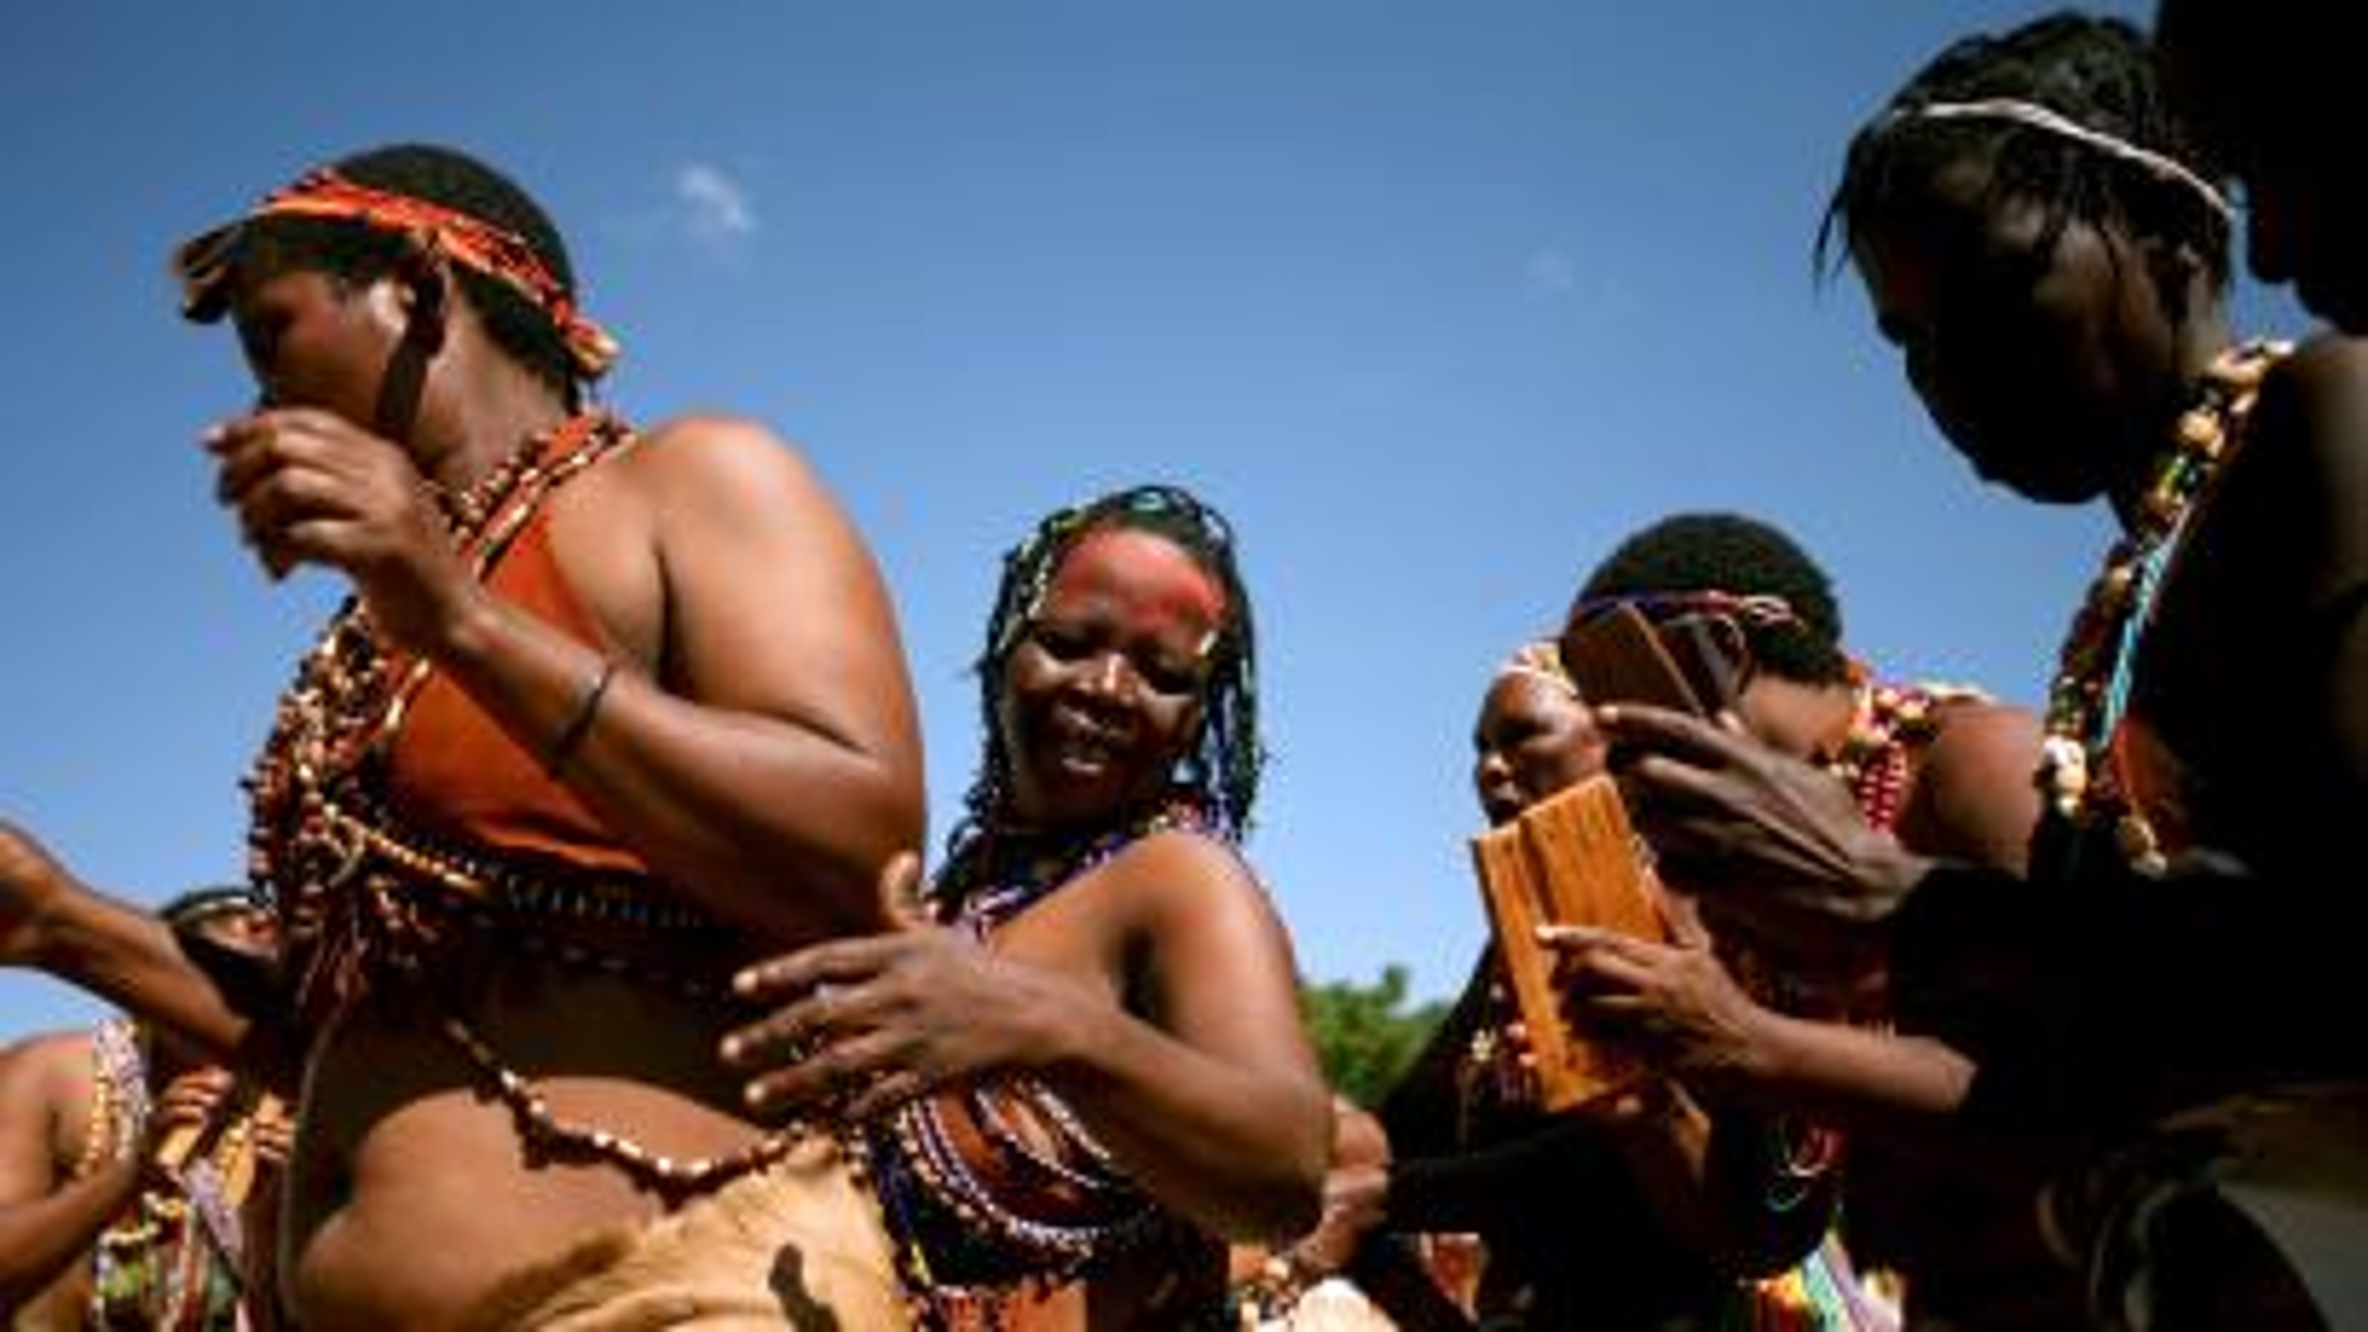 Women dressed in beaded animal skins perform celebratory dances.